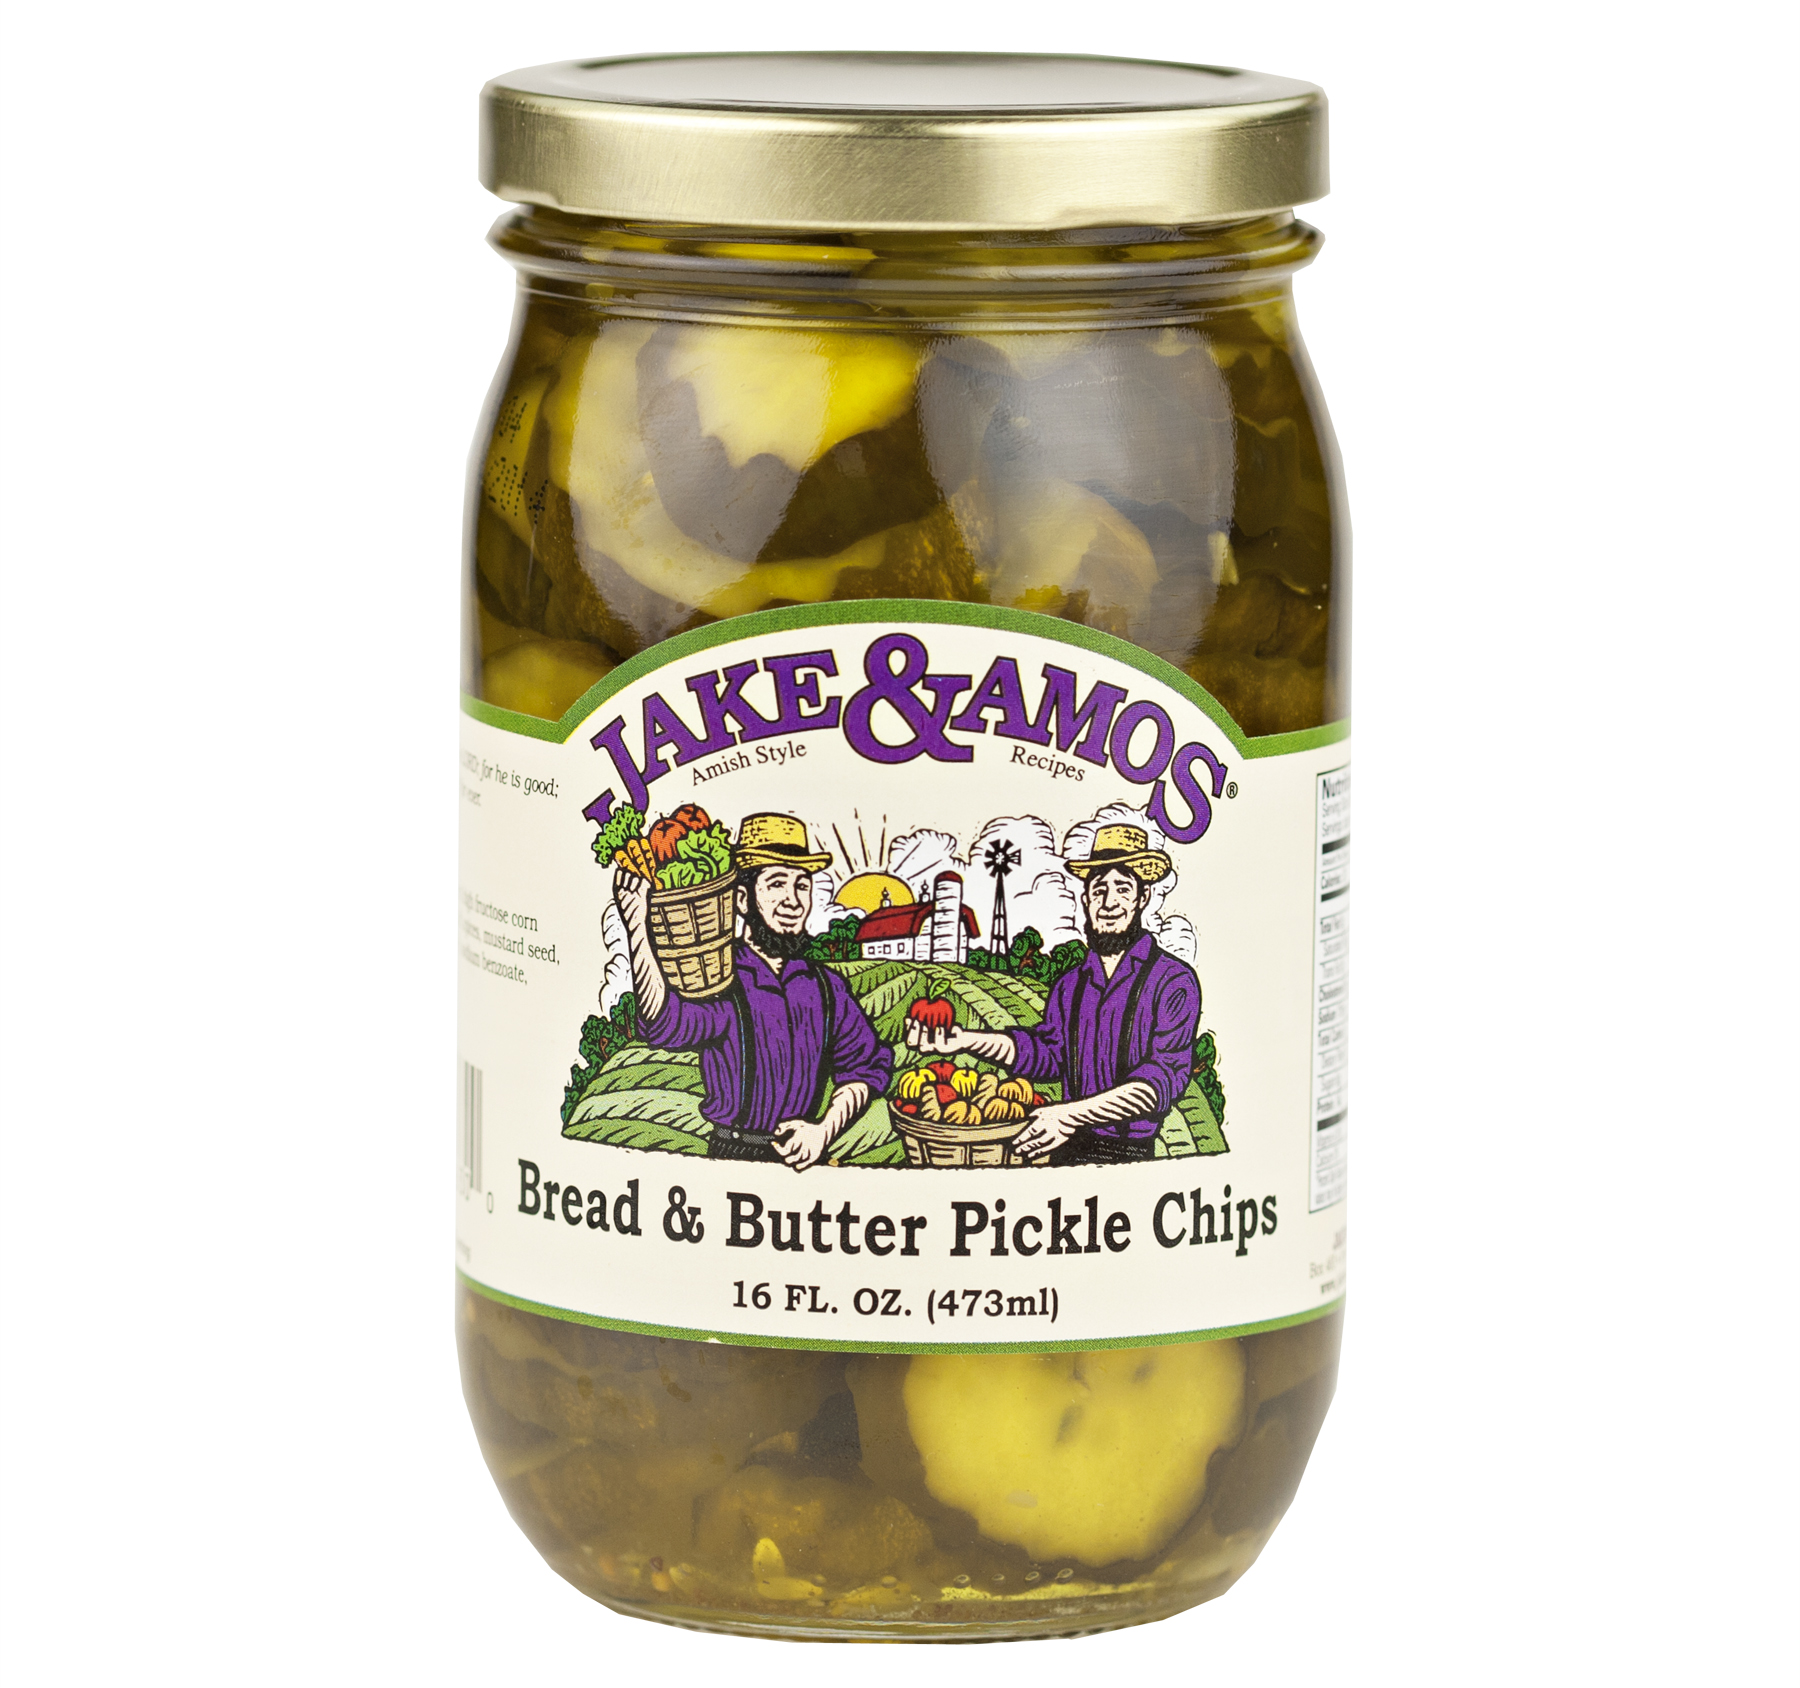 Jake & Amos Bread & Butter Pickle Chips 16 oz. (3 Jars)